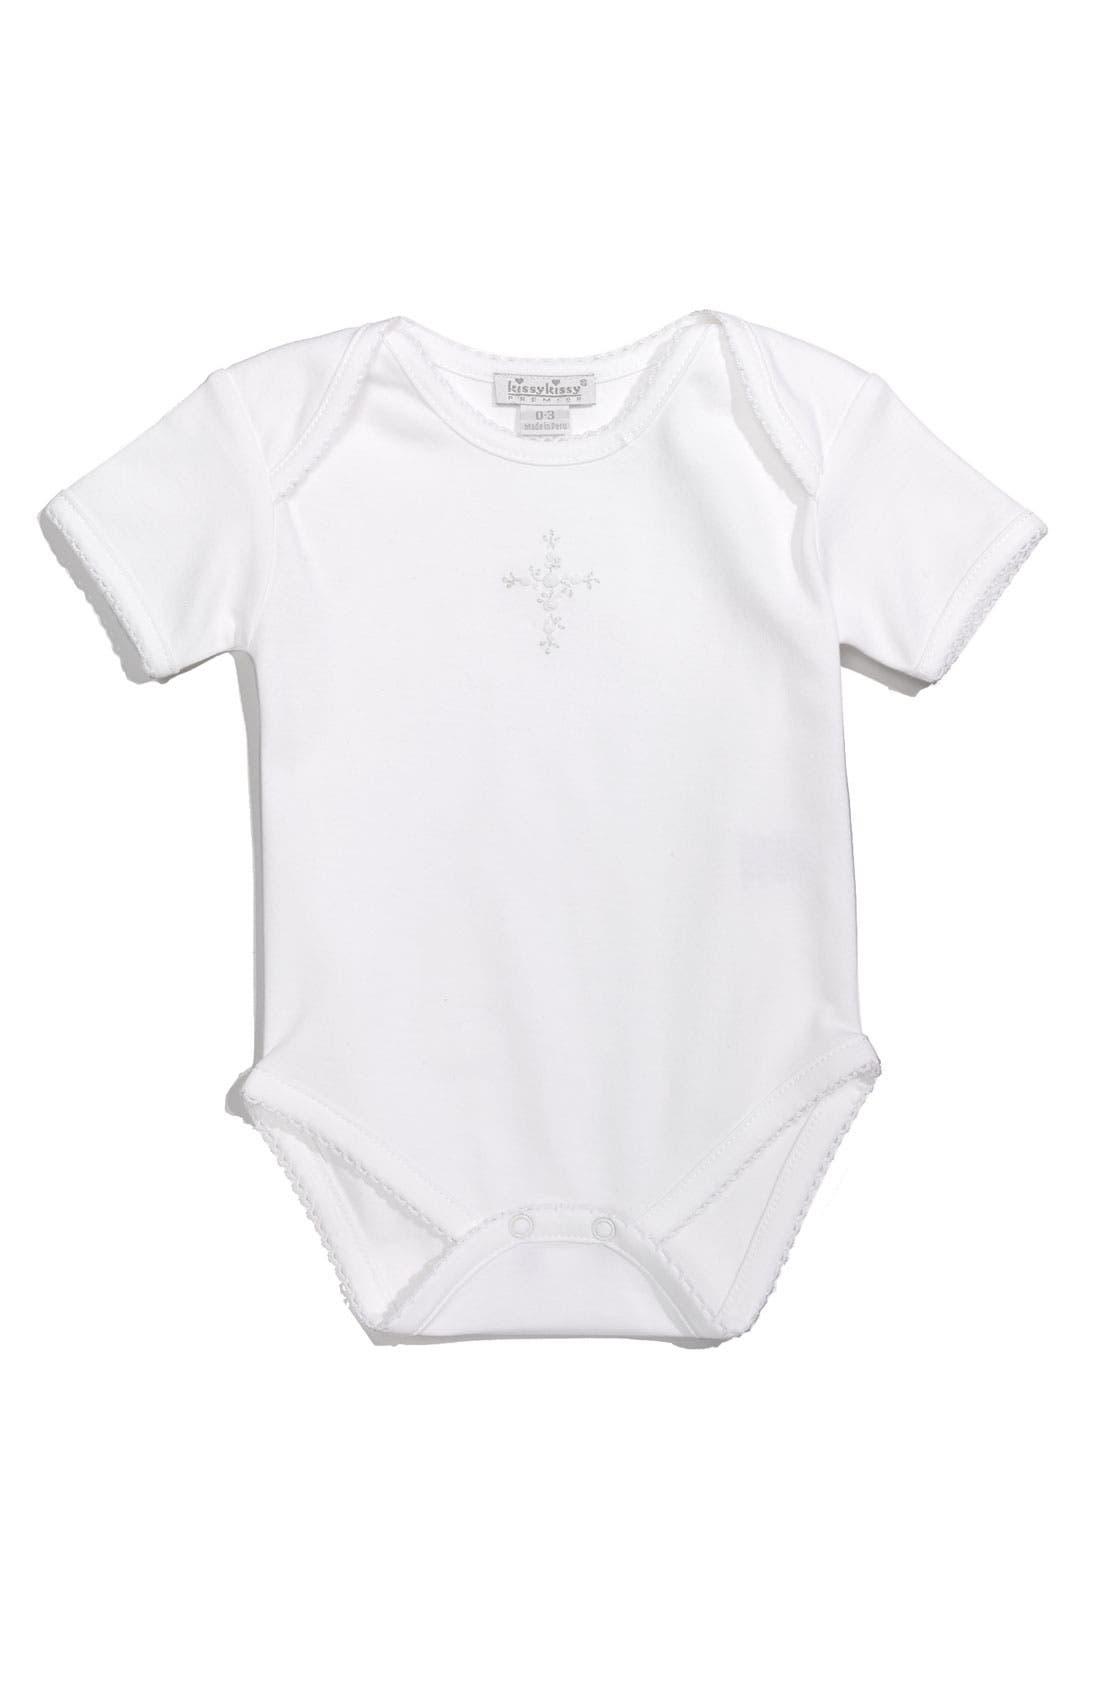 Main Image - Kissy Kissy Embroidered Bodysuit (Infant)